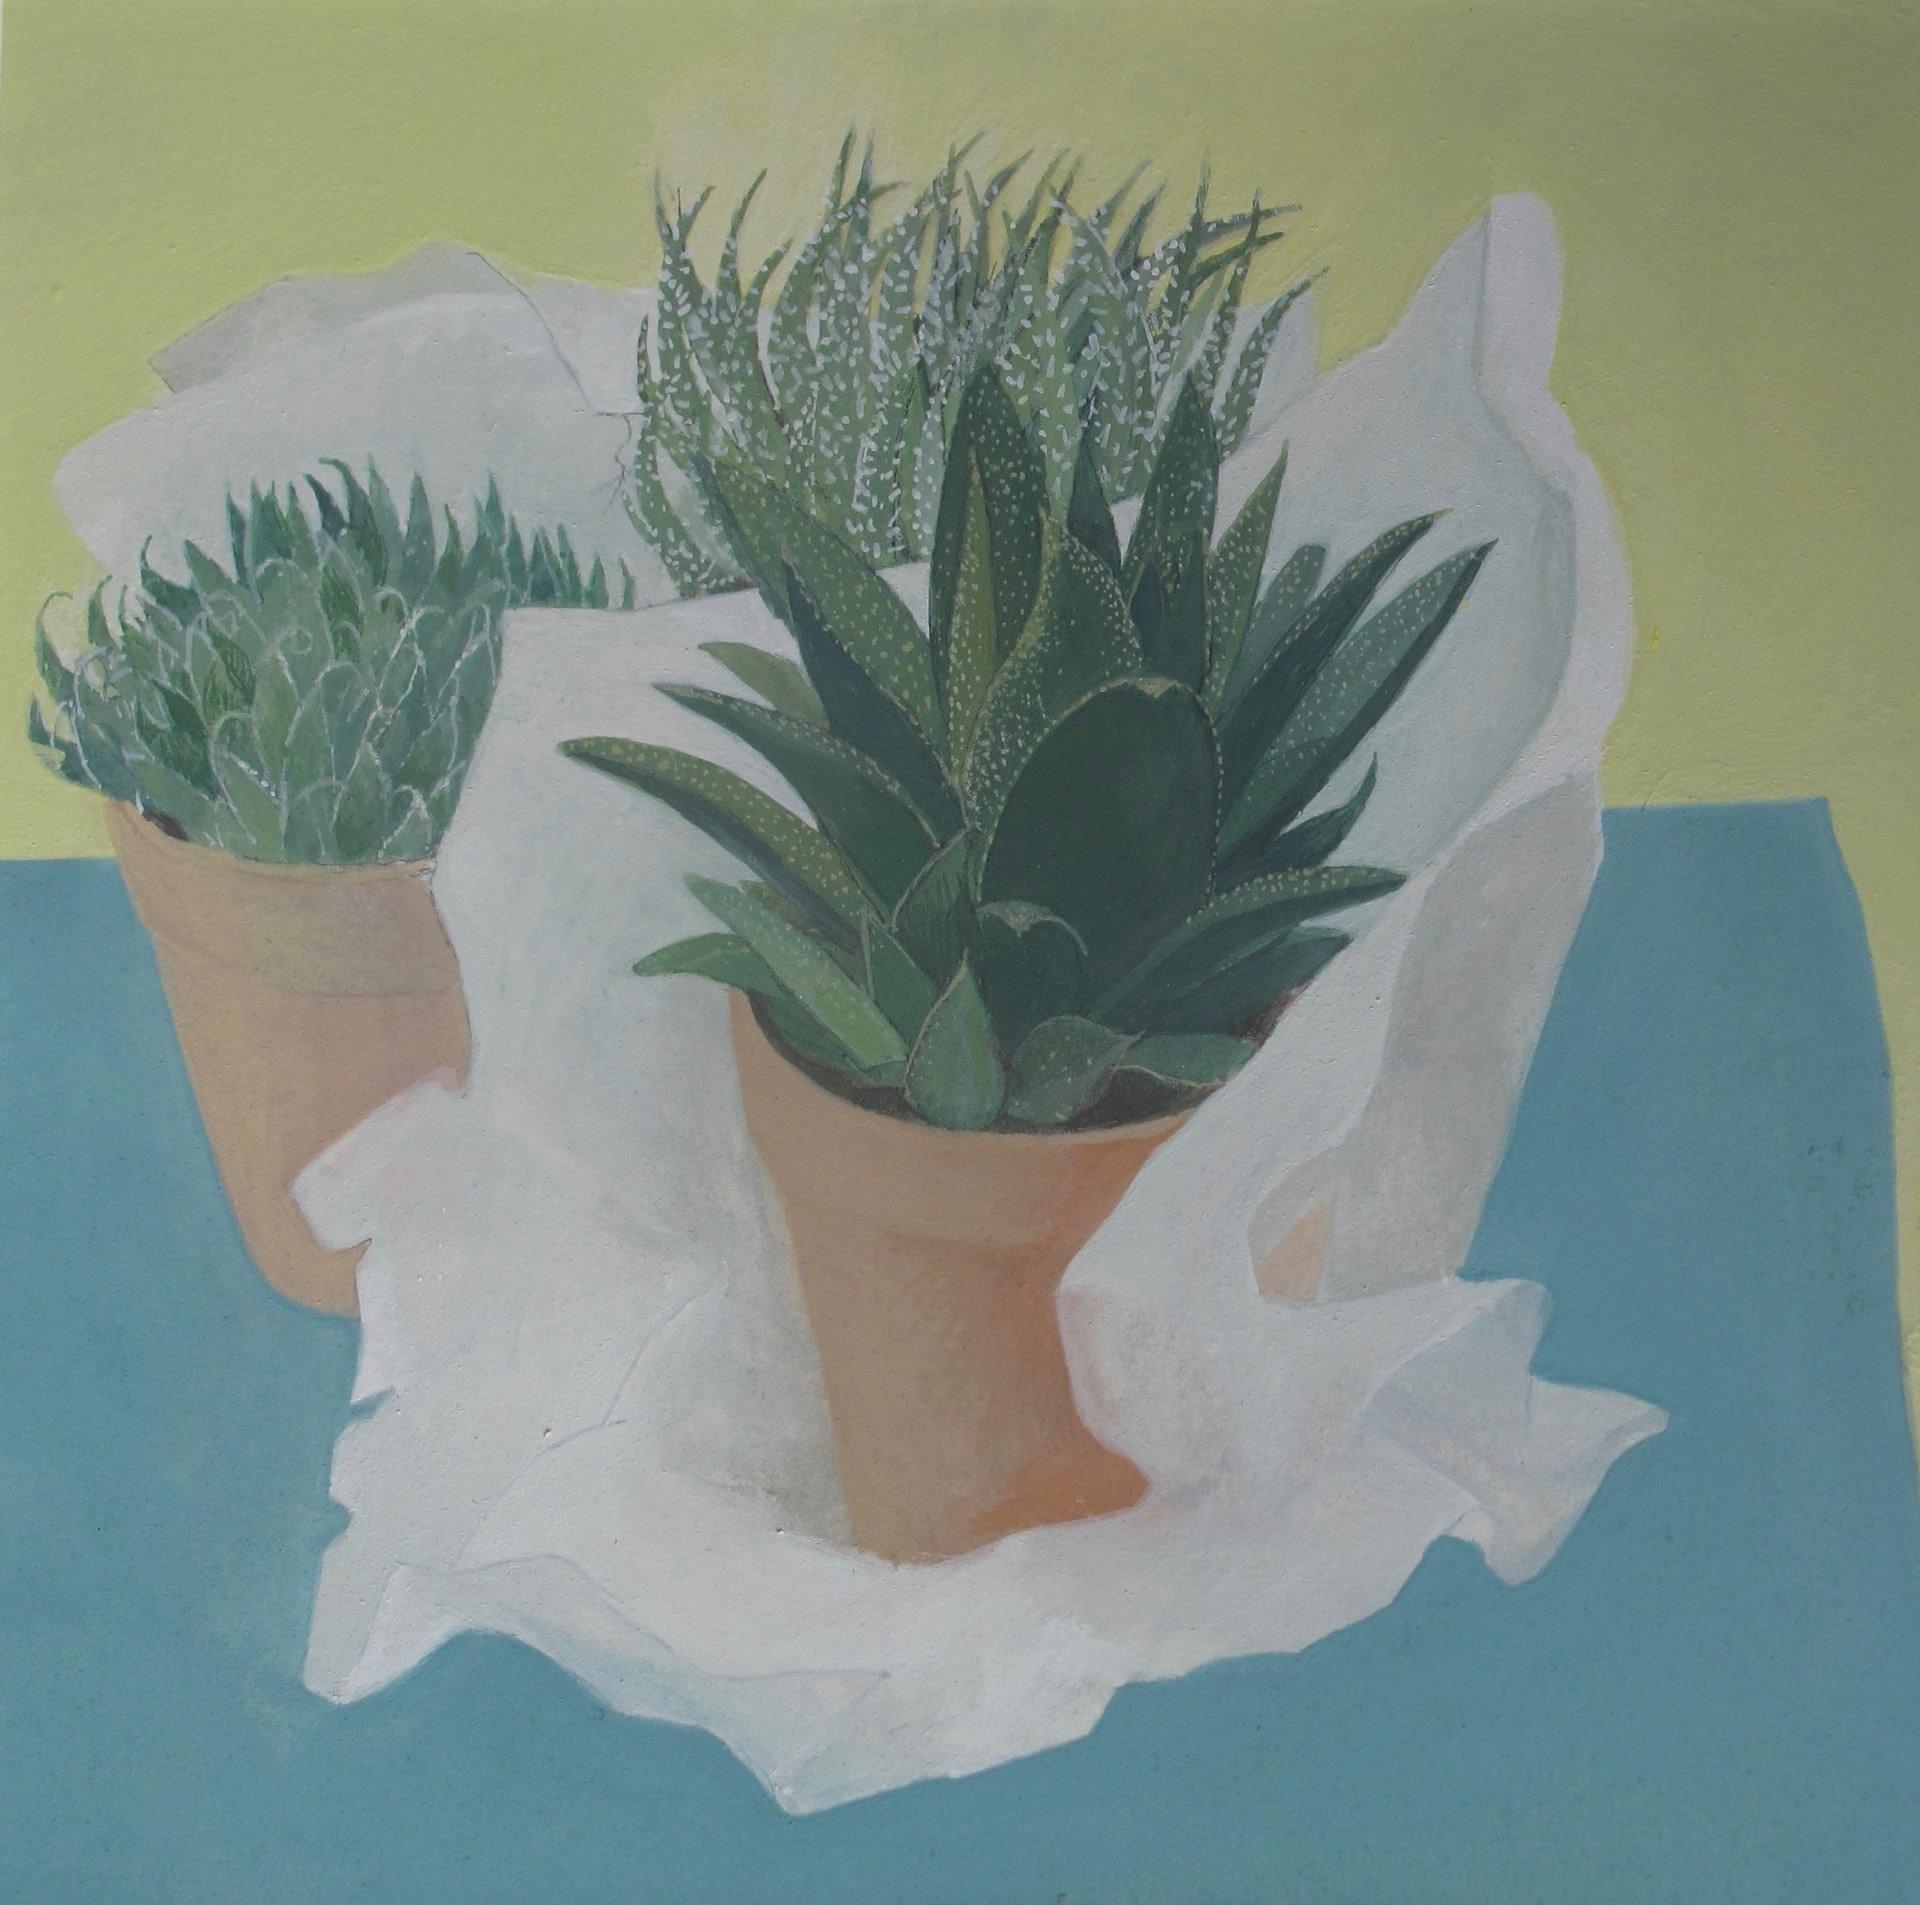 <span class=&#34;link fancybox-details-link&#34;><a href=&#34;/exhibitions/24/works/artworks_standalone10721/&#34;>View Detail Page</a></span><div class=&#34;artist&#34;><span class=&#34;artist&#34;><strong>Wendy Jacob</strong></span></div><div class=&#34;title&#34;><em>Unwrapping Plants</em></div><div class=&#34;medium&#34;>gouache</div><div class=&#34;dimensions&#34;>53 x 53cm</div>